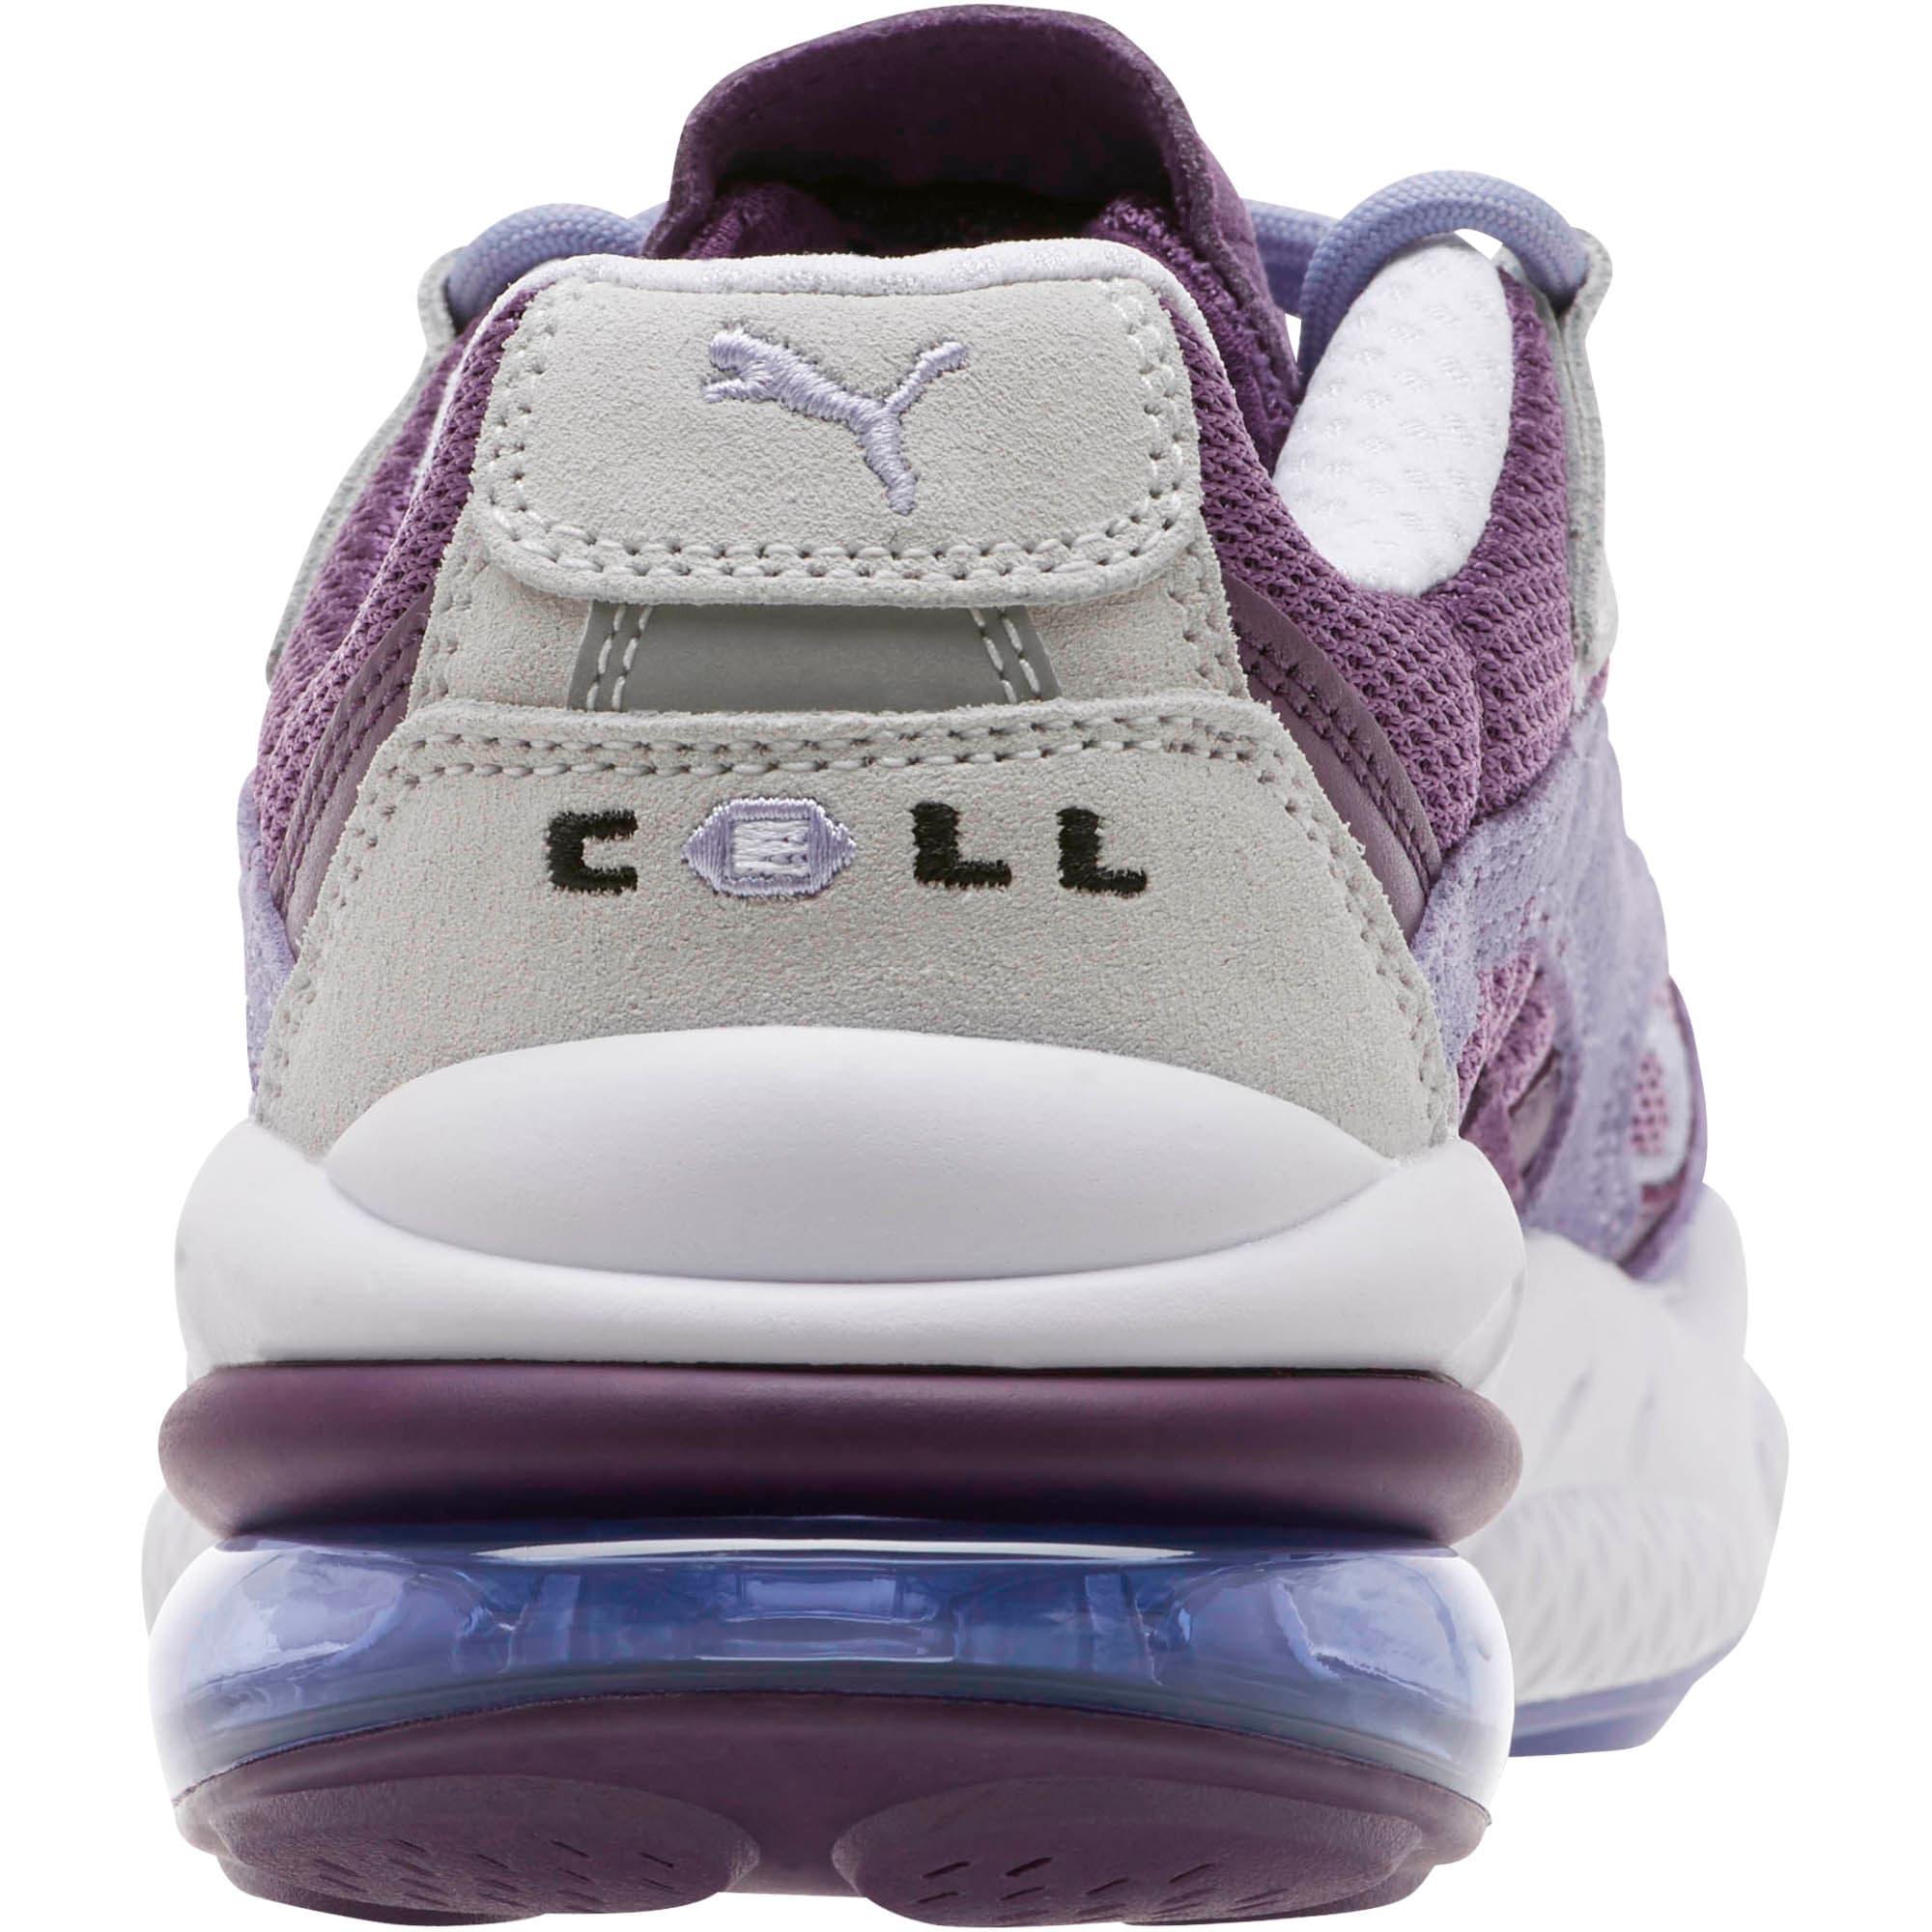 Thumbnail 4 of CELL Venom Women's Sneakers, Sweet Lavender-Indigo, medium